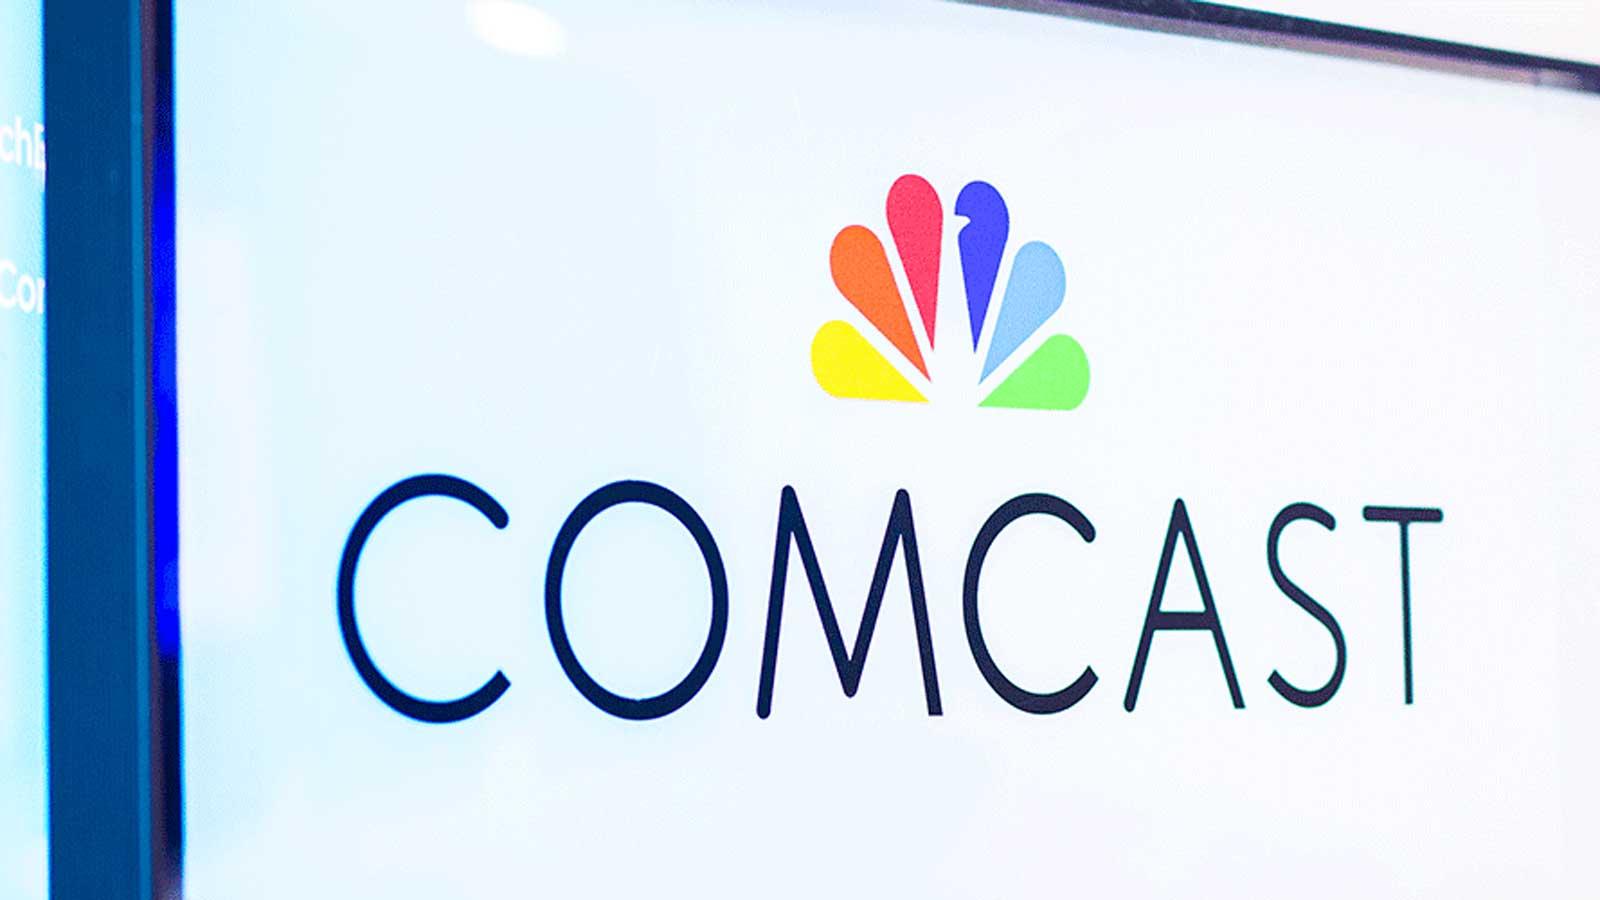 Comcast signage